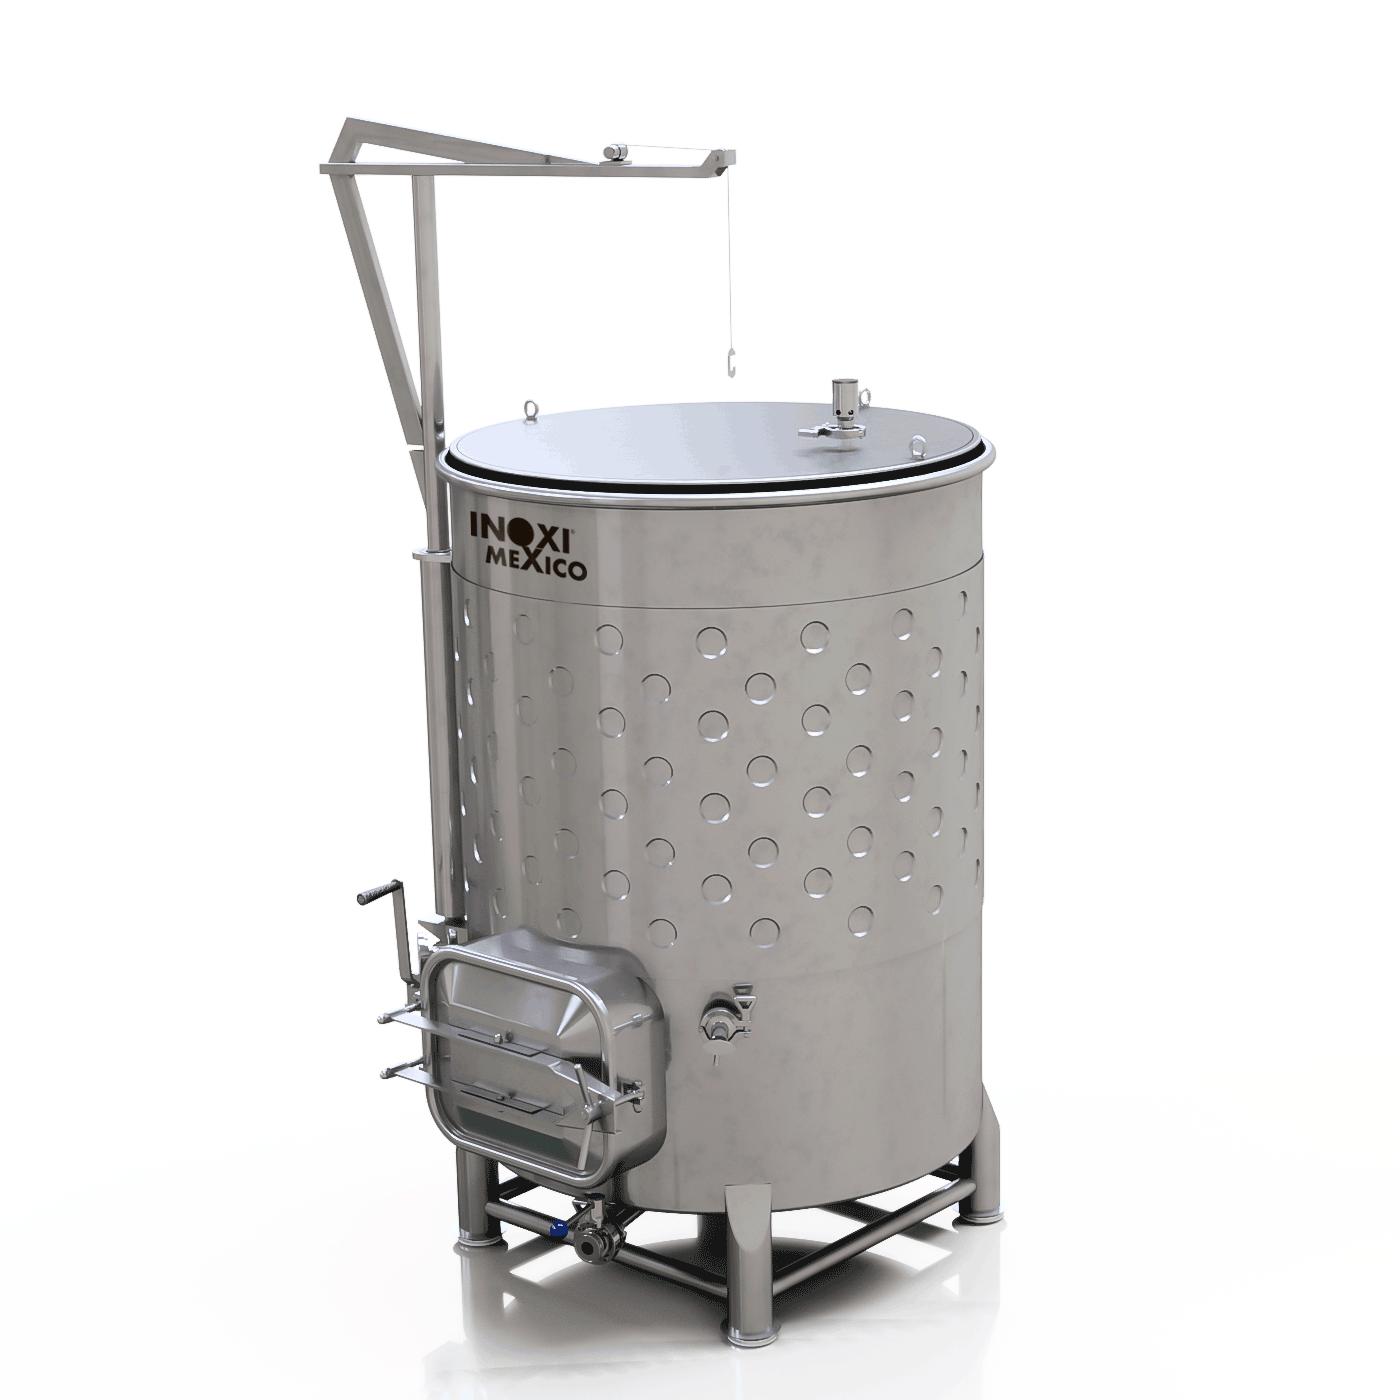 Fermentador Variable para Vino Blanco/Vino Tinto/Sidra 1500L